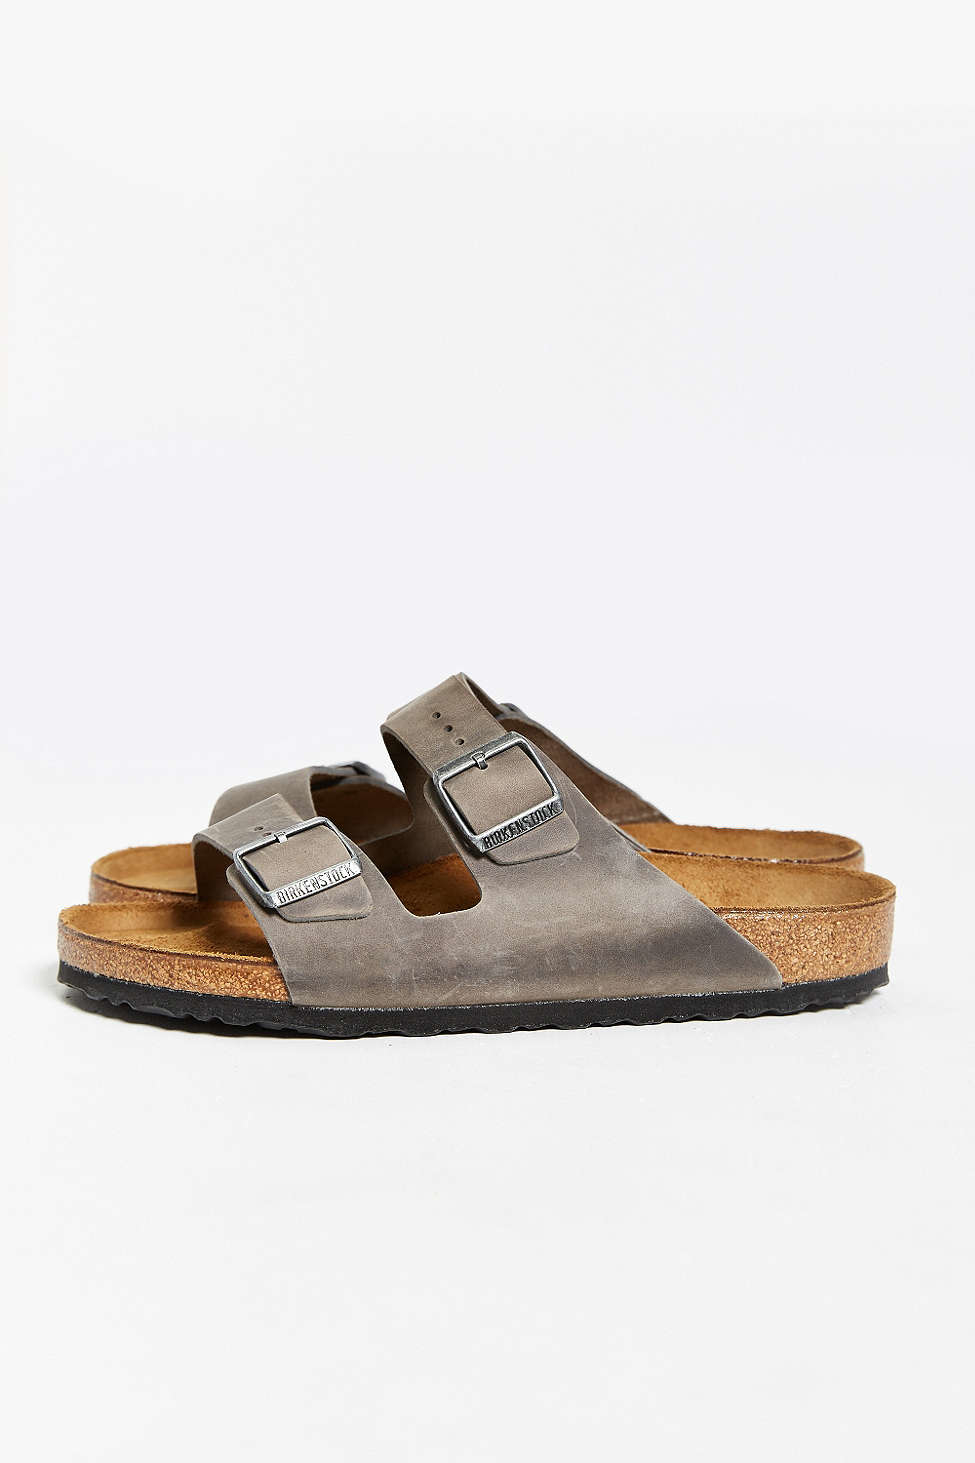 Saks Brand Mens Shoes